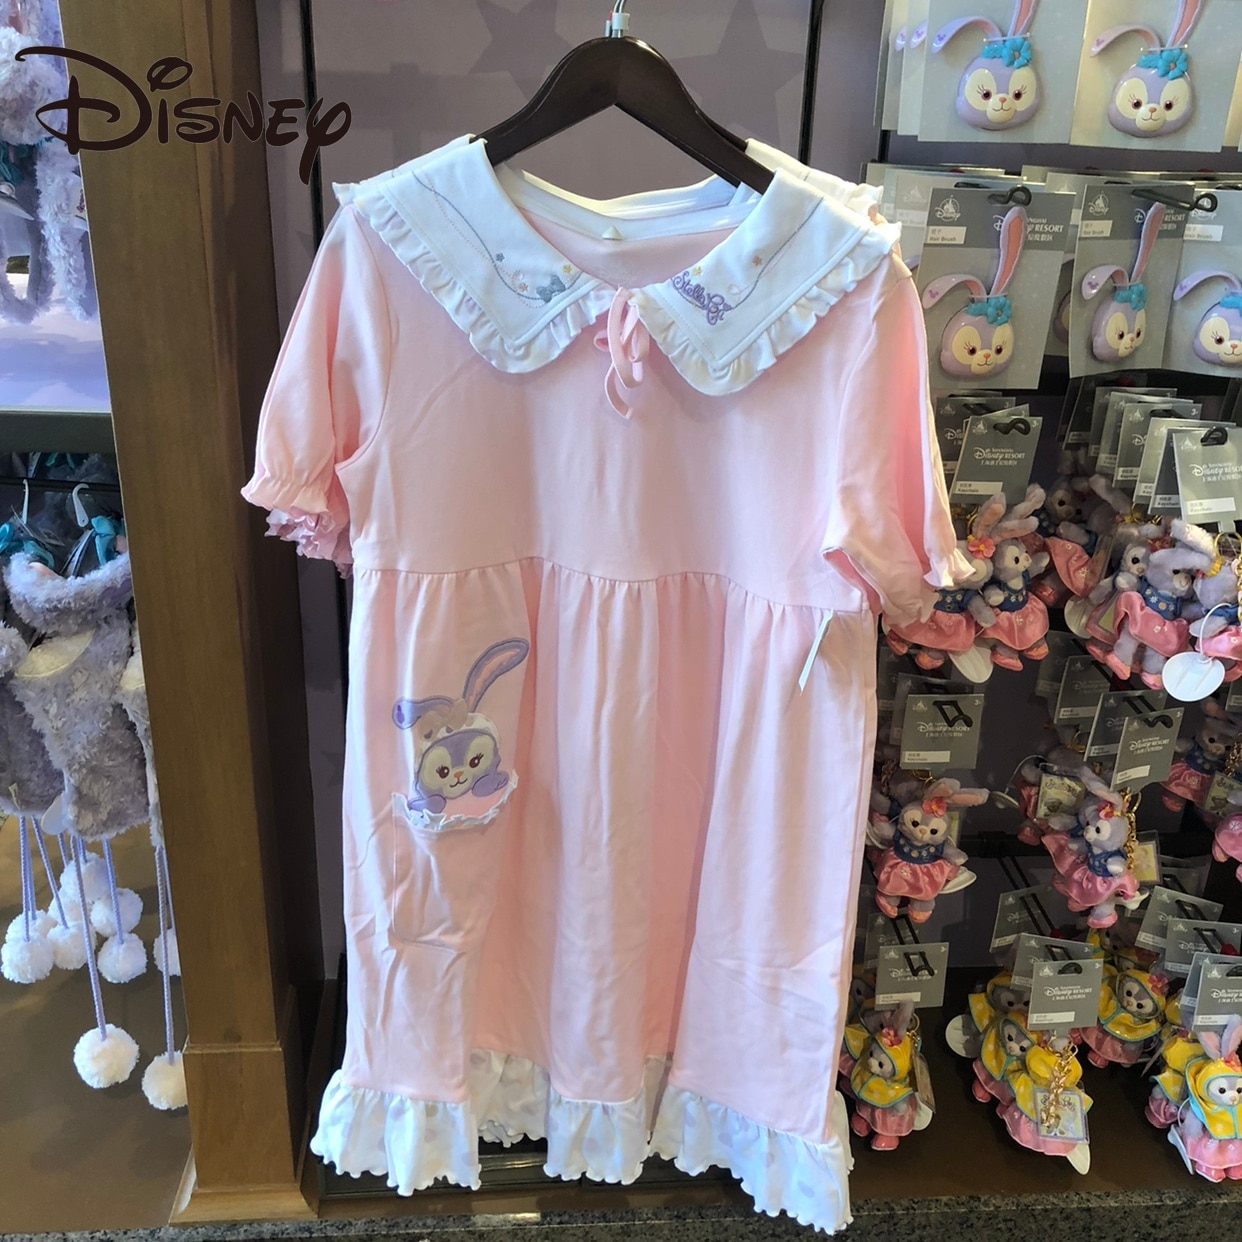 Disney StellaLou Pink Cute Cartoon Nightdress Knitted Home Wear Rabbit Nightdress Knee-Length long skirts for women